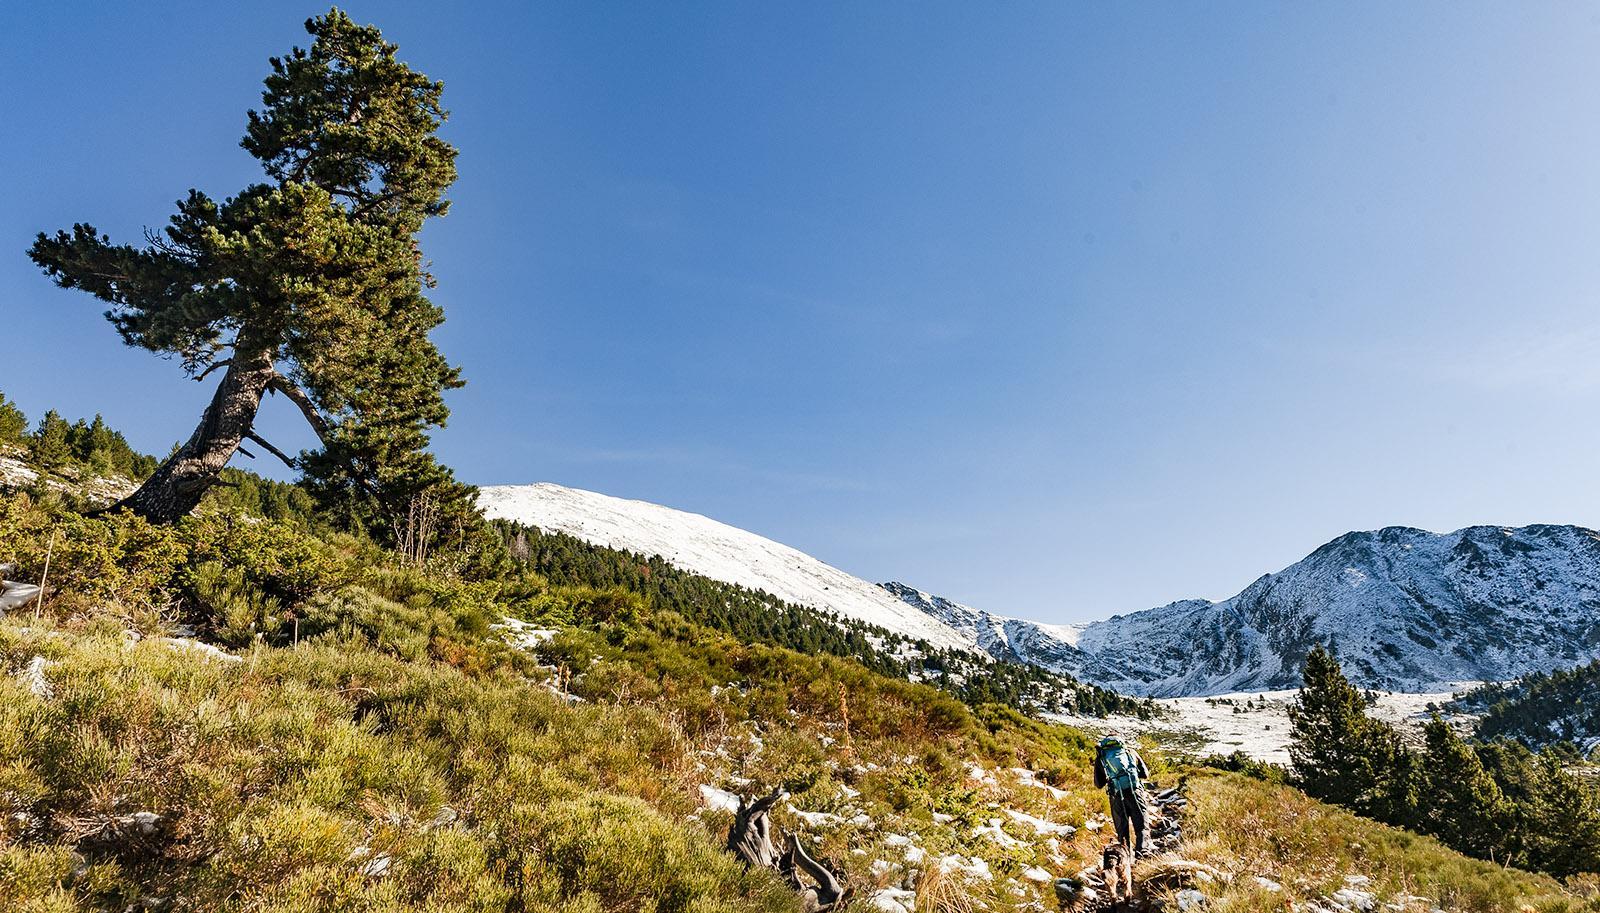 Canigo: Auf dem Weg zur Schutzhütte Refuge d'Arago. Foto: Hilke Maunder